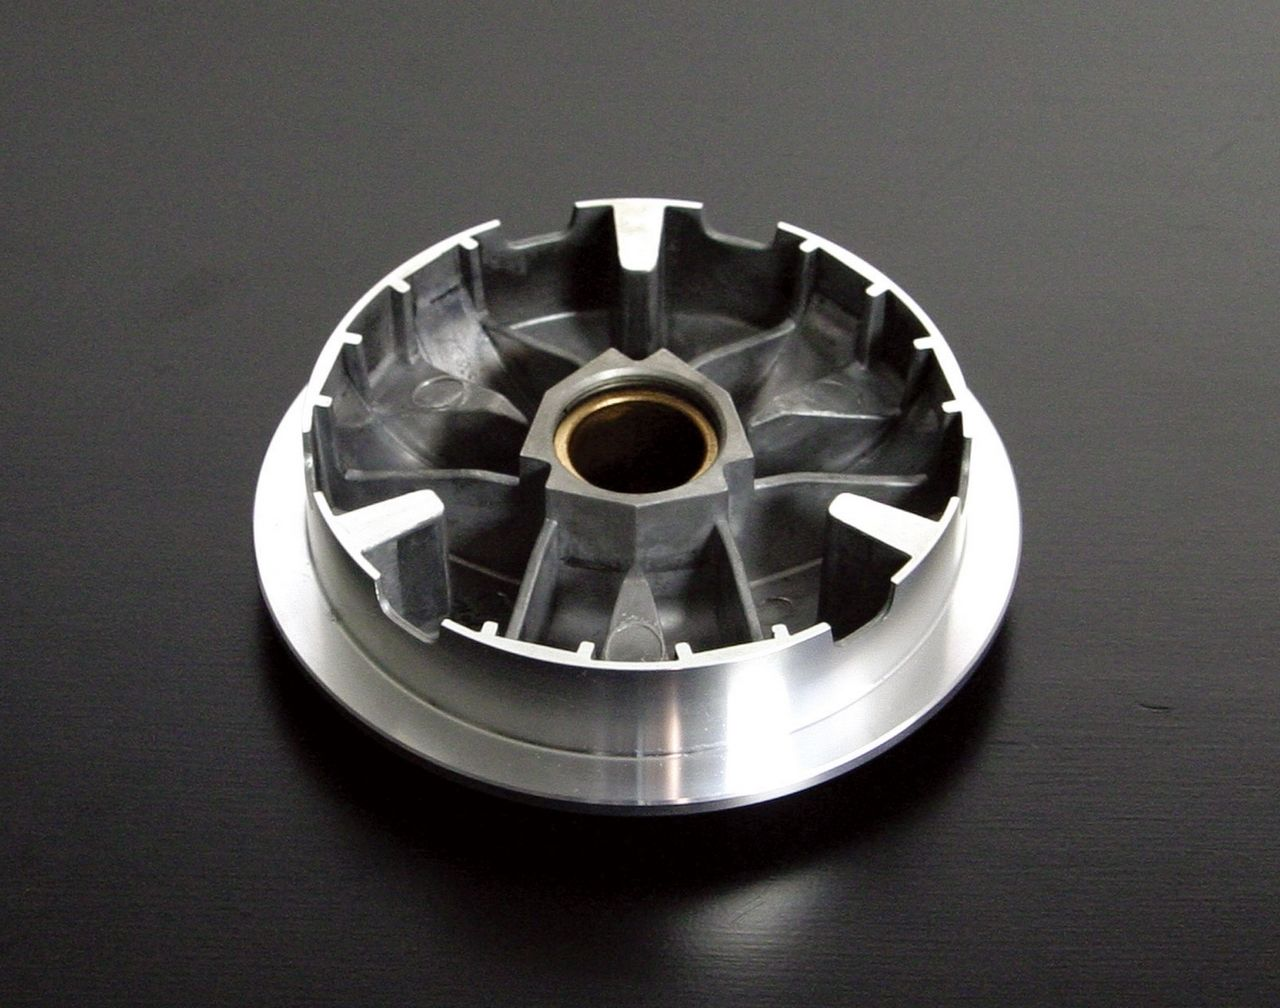 CYGNUSX (新勁戰)用高速普立盤